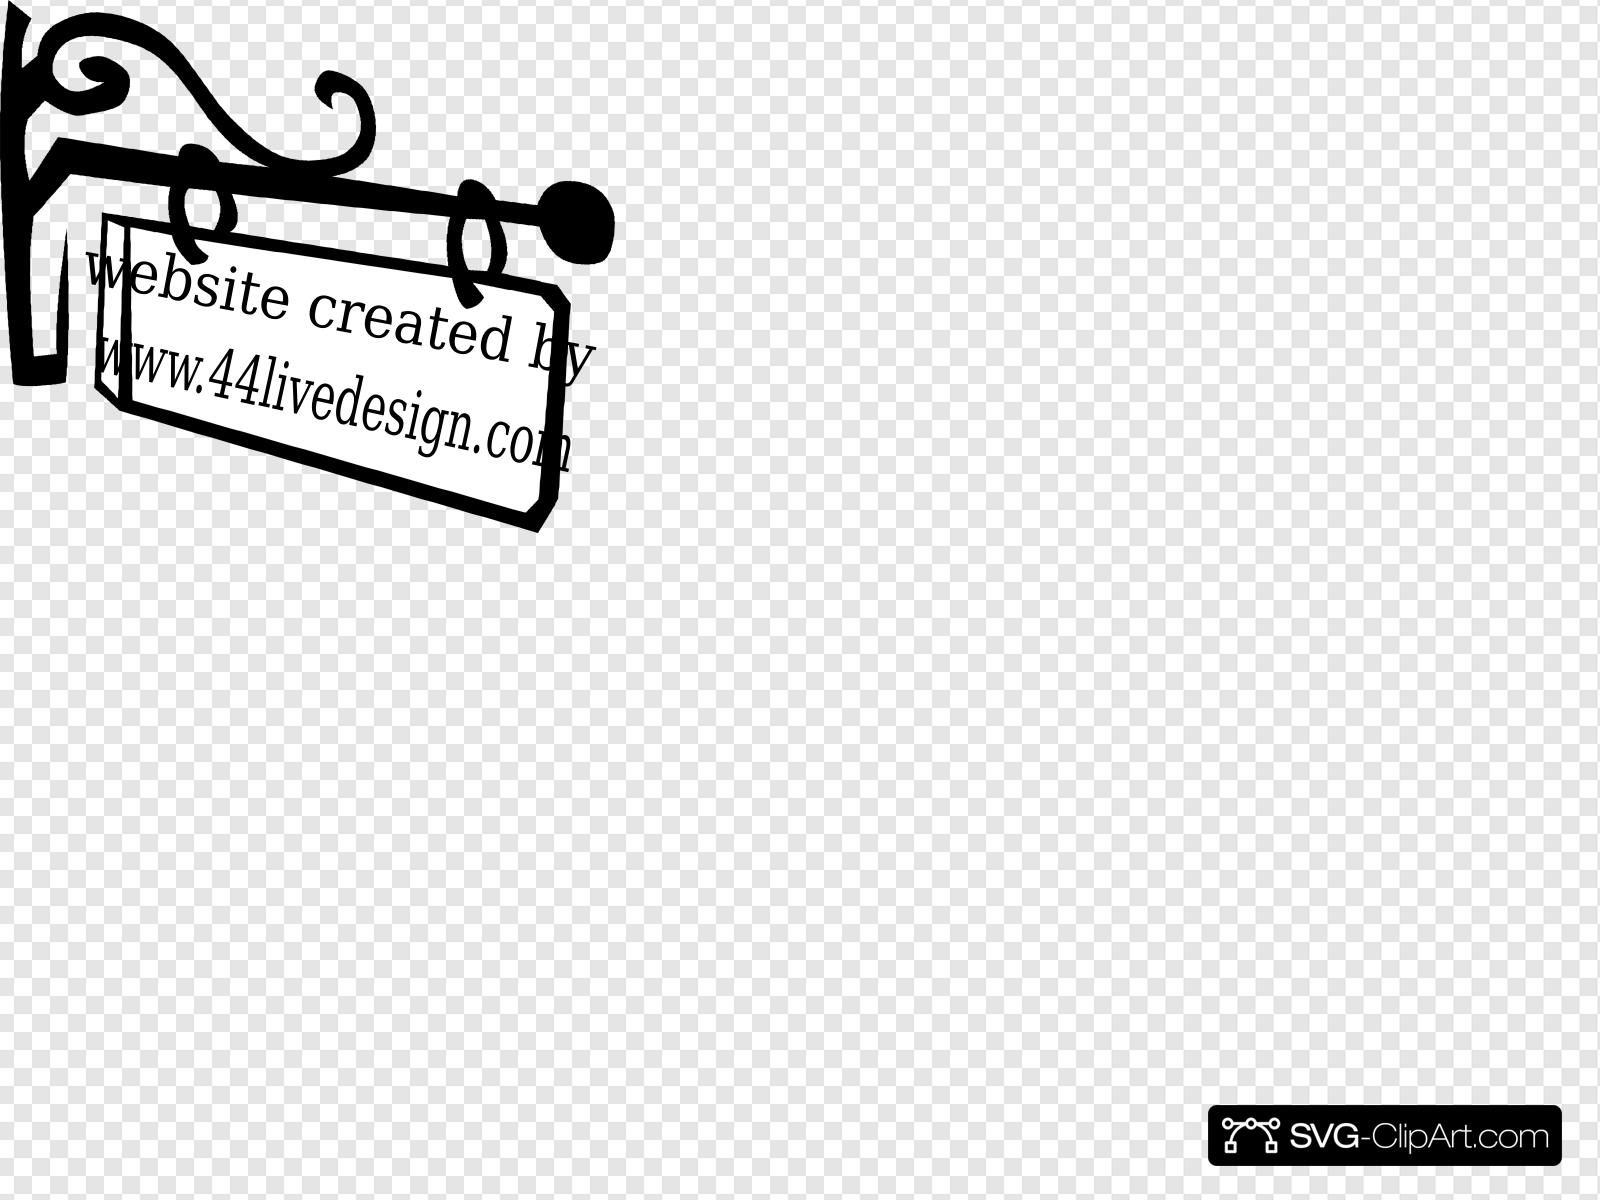 Logo2 Clip art, Icon and SVG.